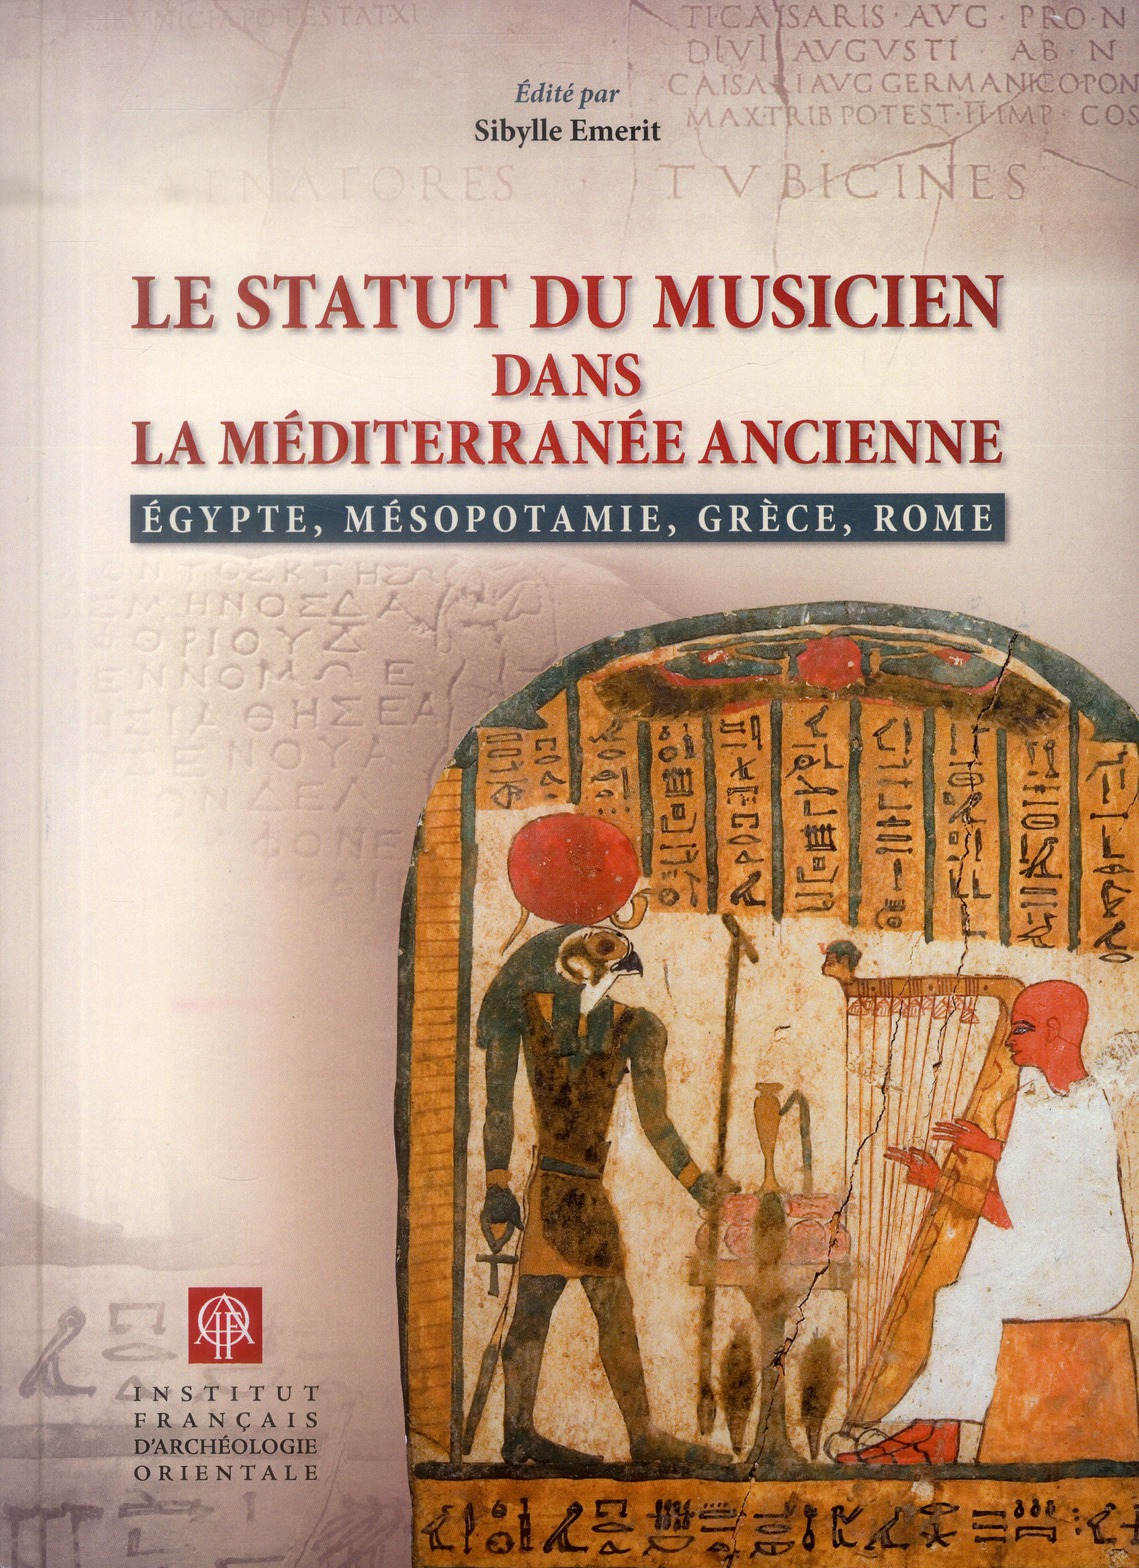 Statut du musicien dans la mediterranee ancienne  egypte mesopotamie grece rome